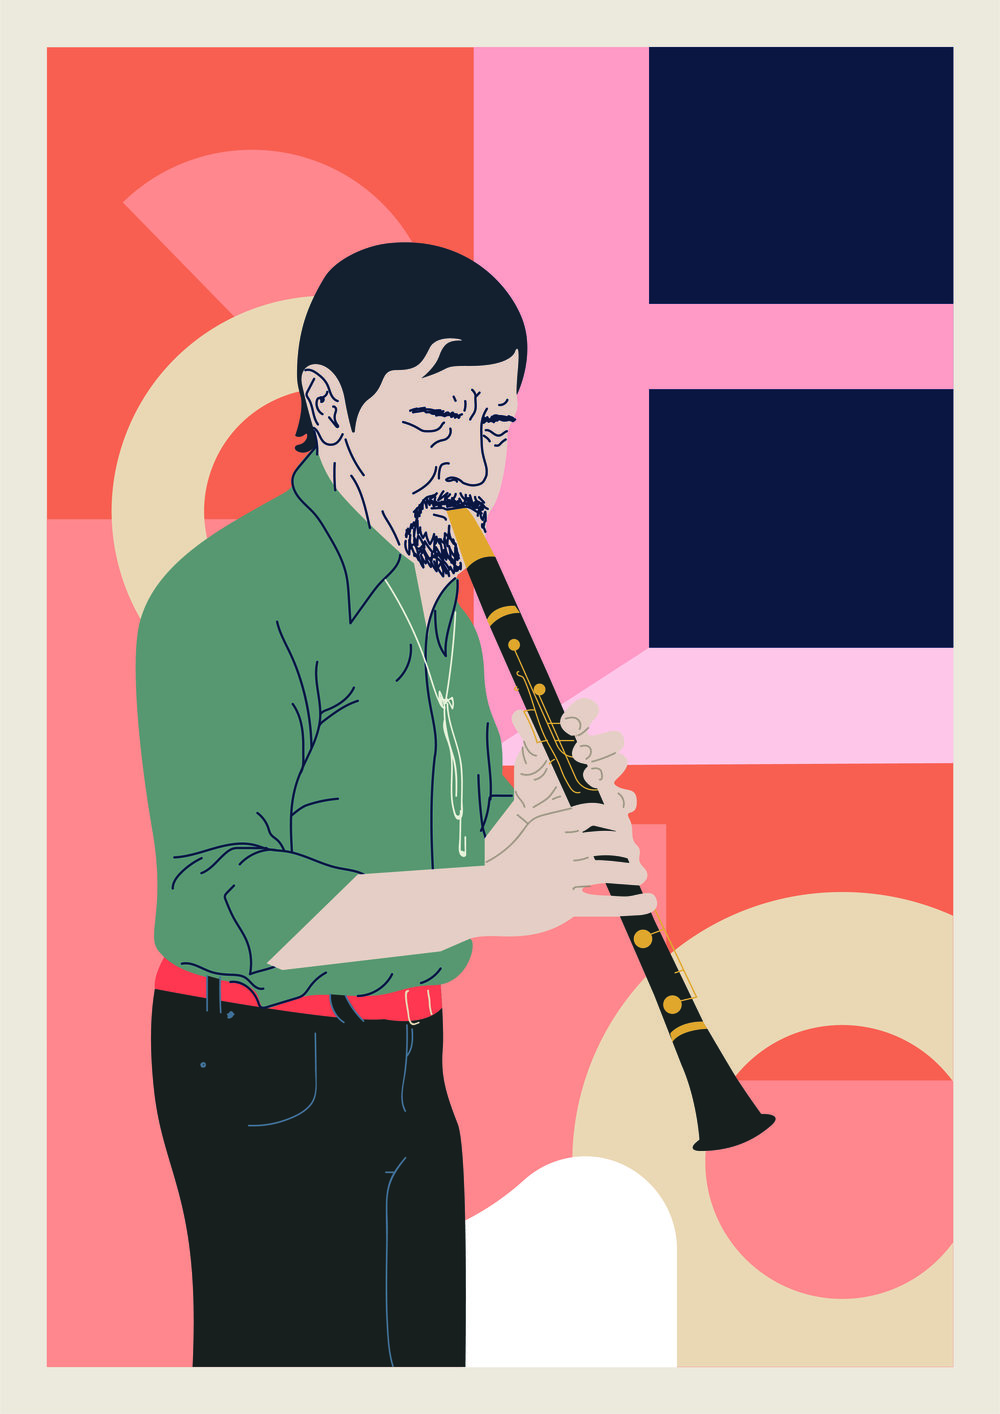 Music man-03.jpg